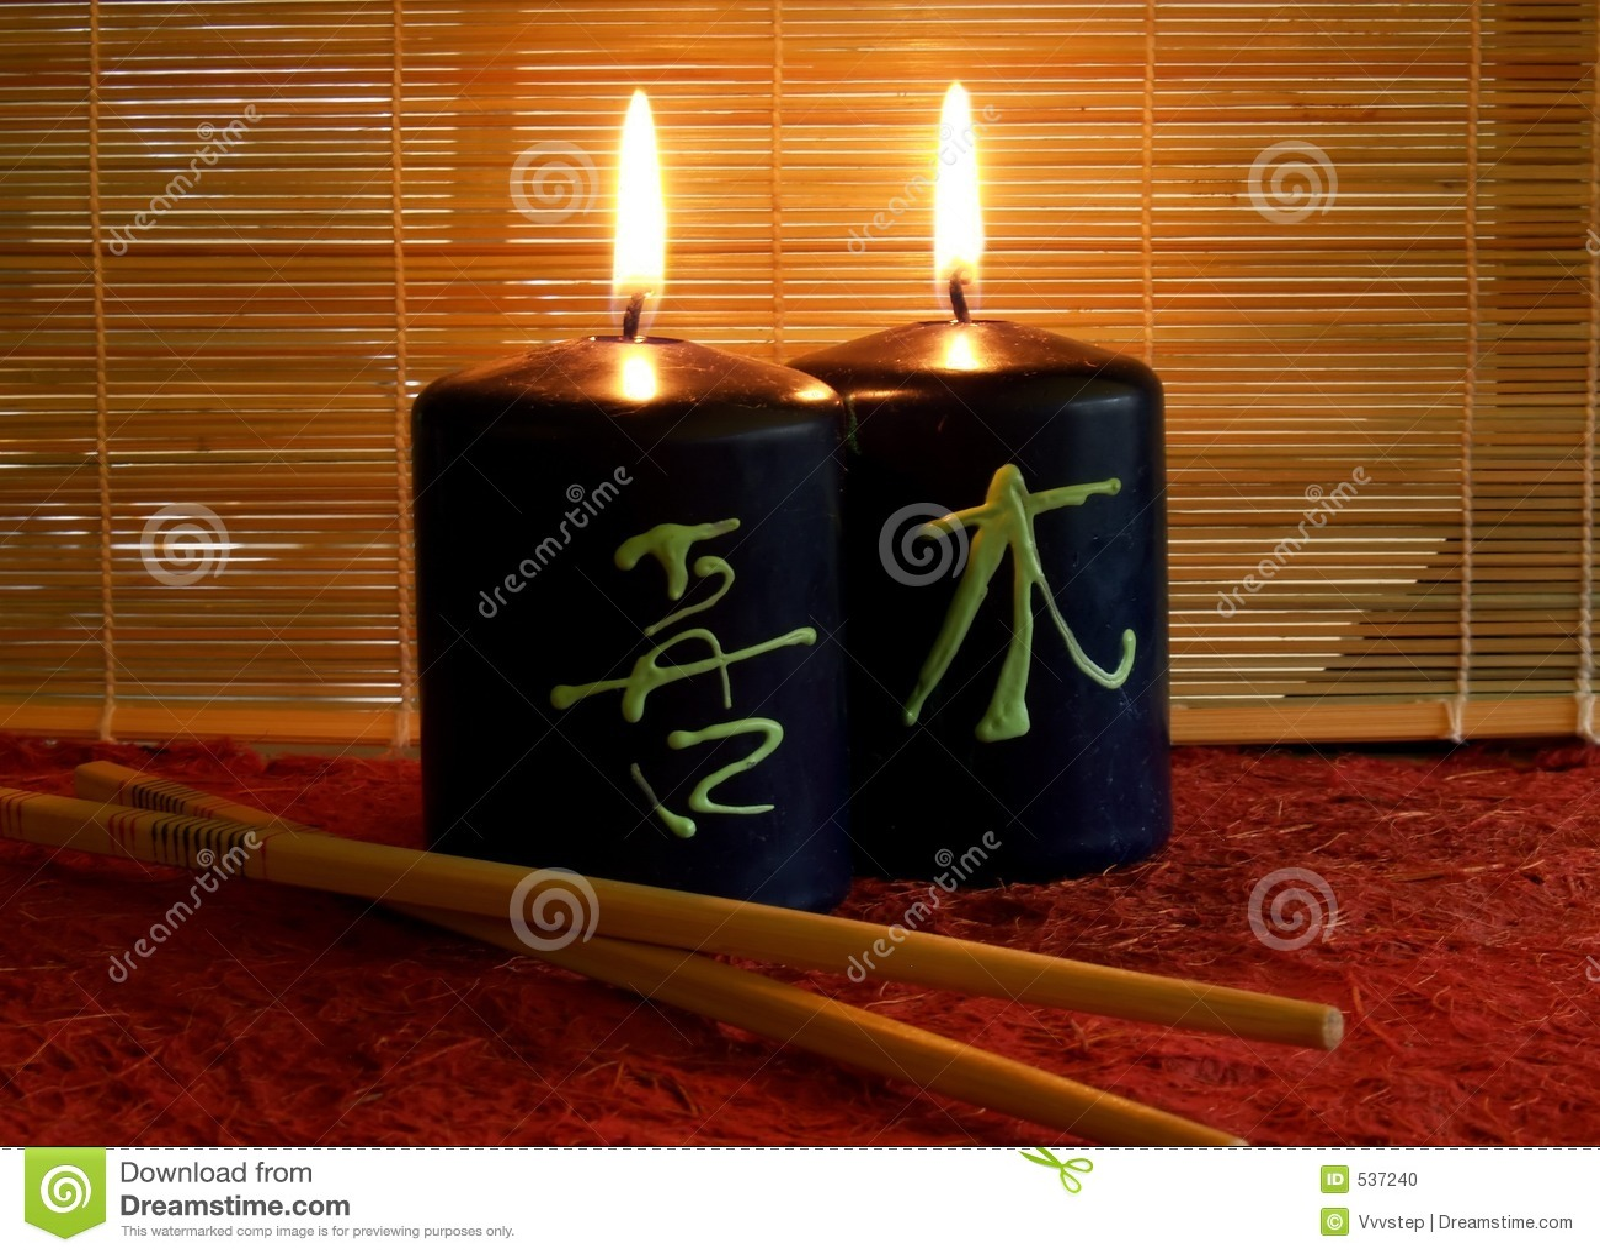 Duas velas iluminadas